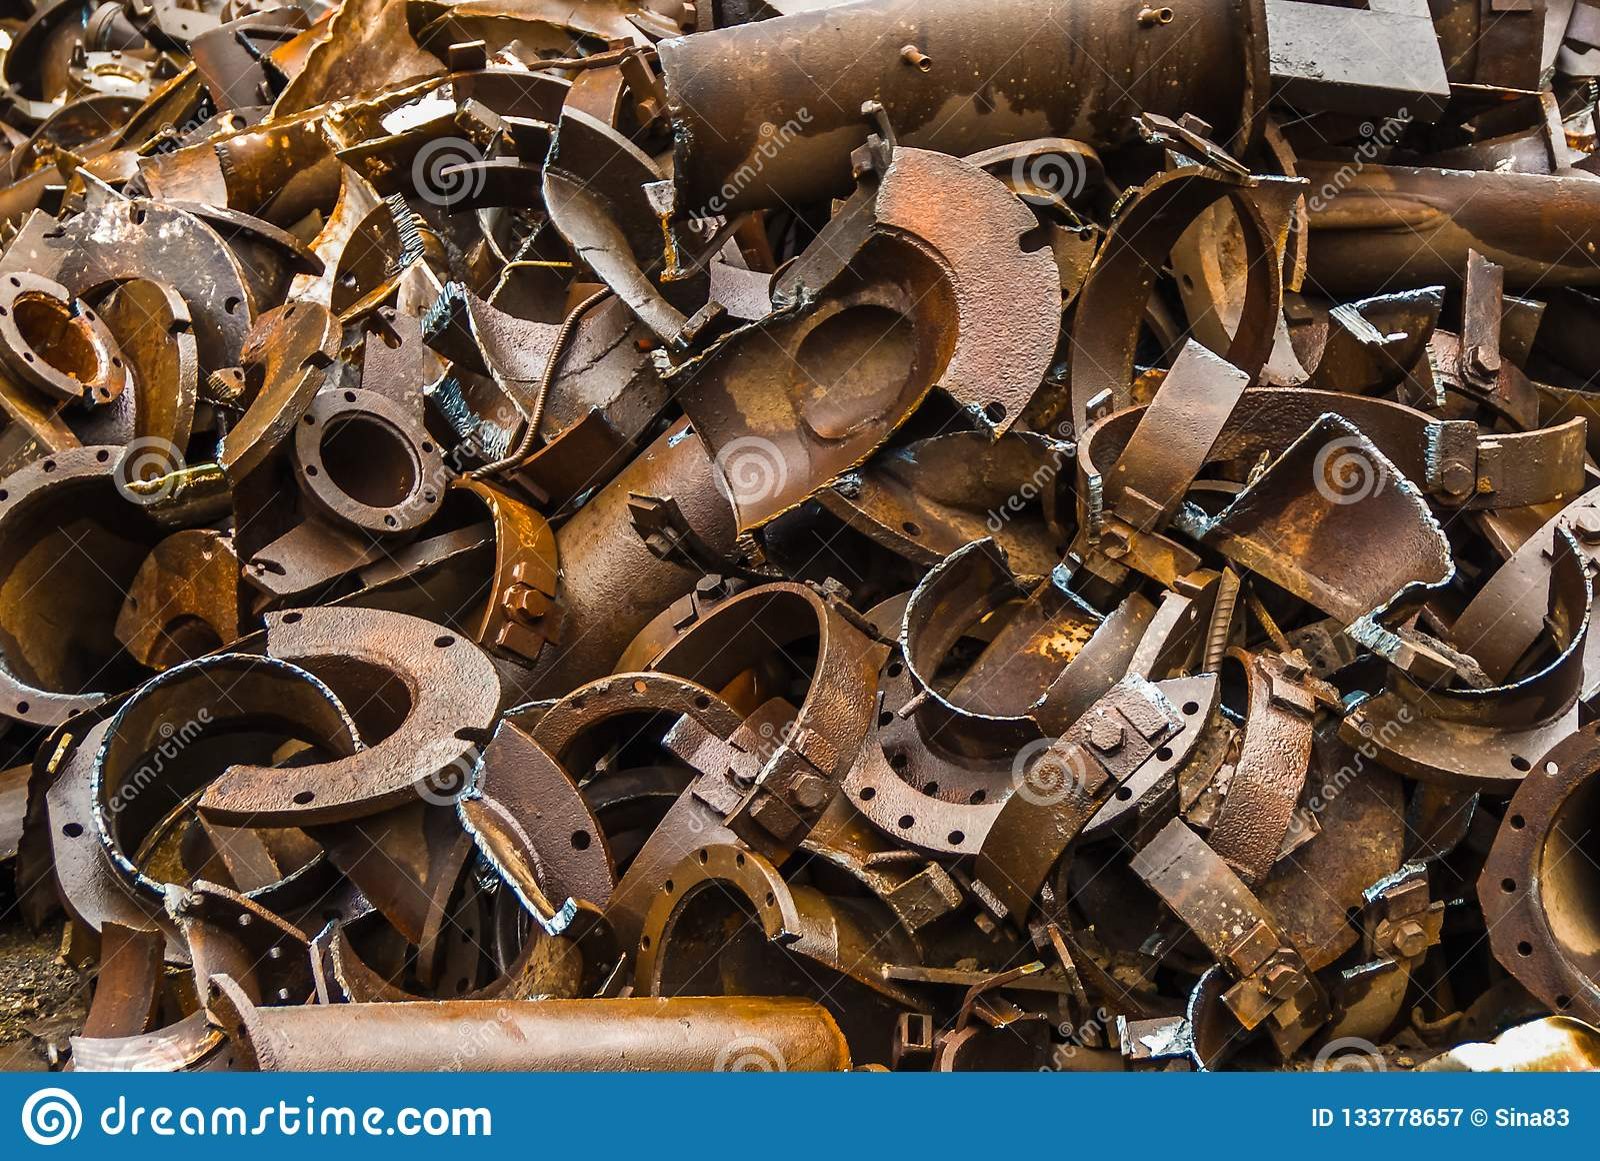 Broken Metal Trash Metallurgy Fabrik In Arbed Luxemburg Stock Image